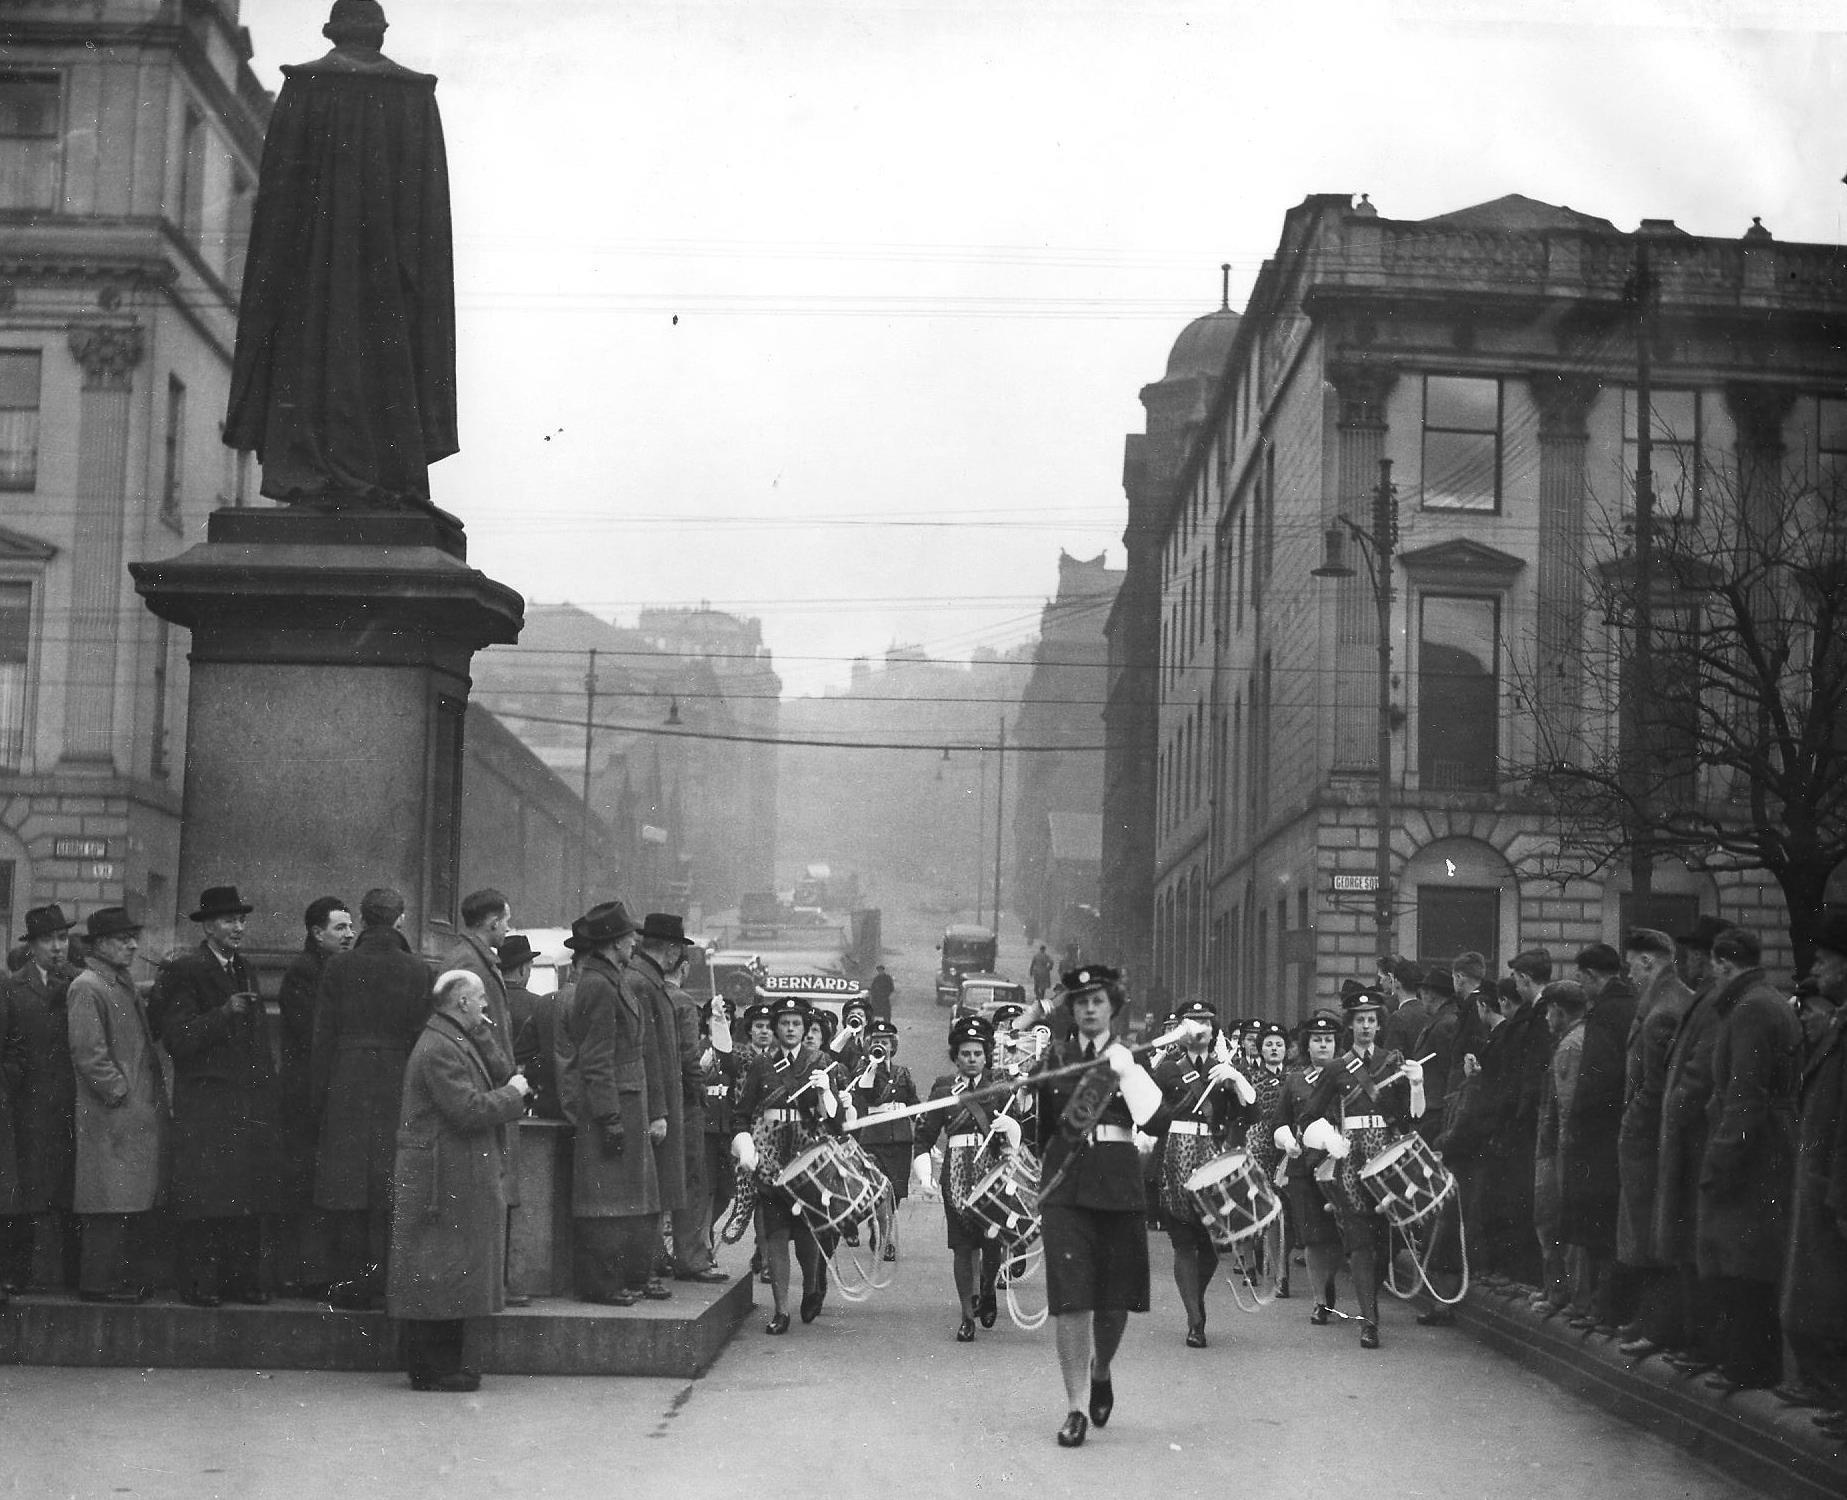 THOSE WERE THE DAYS - 1948: W.R.A.F. band entertains public as Princess Royal awaits